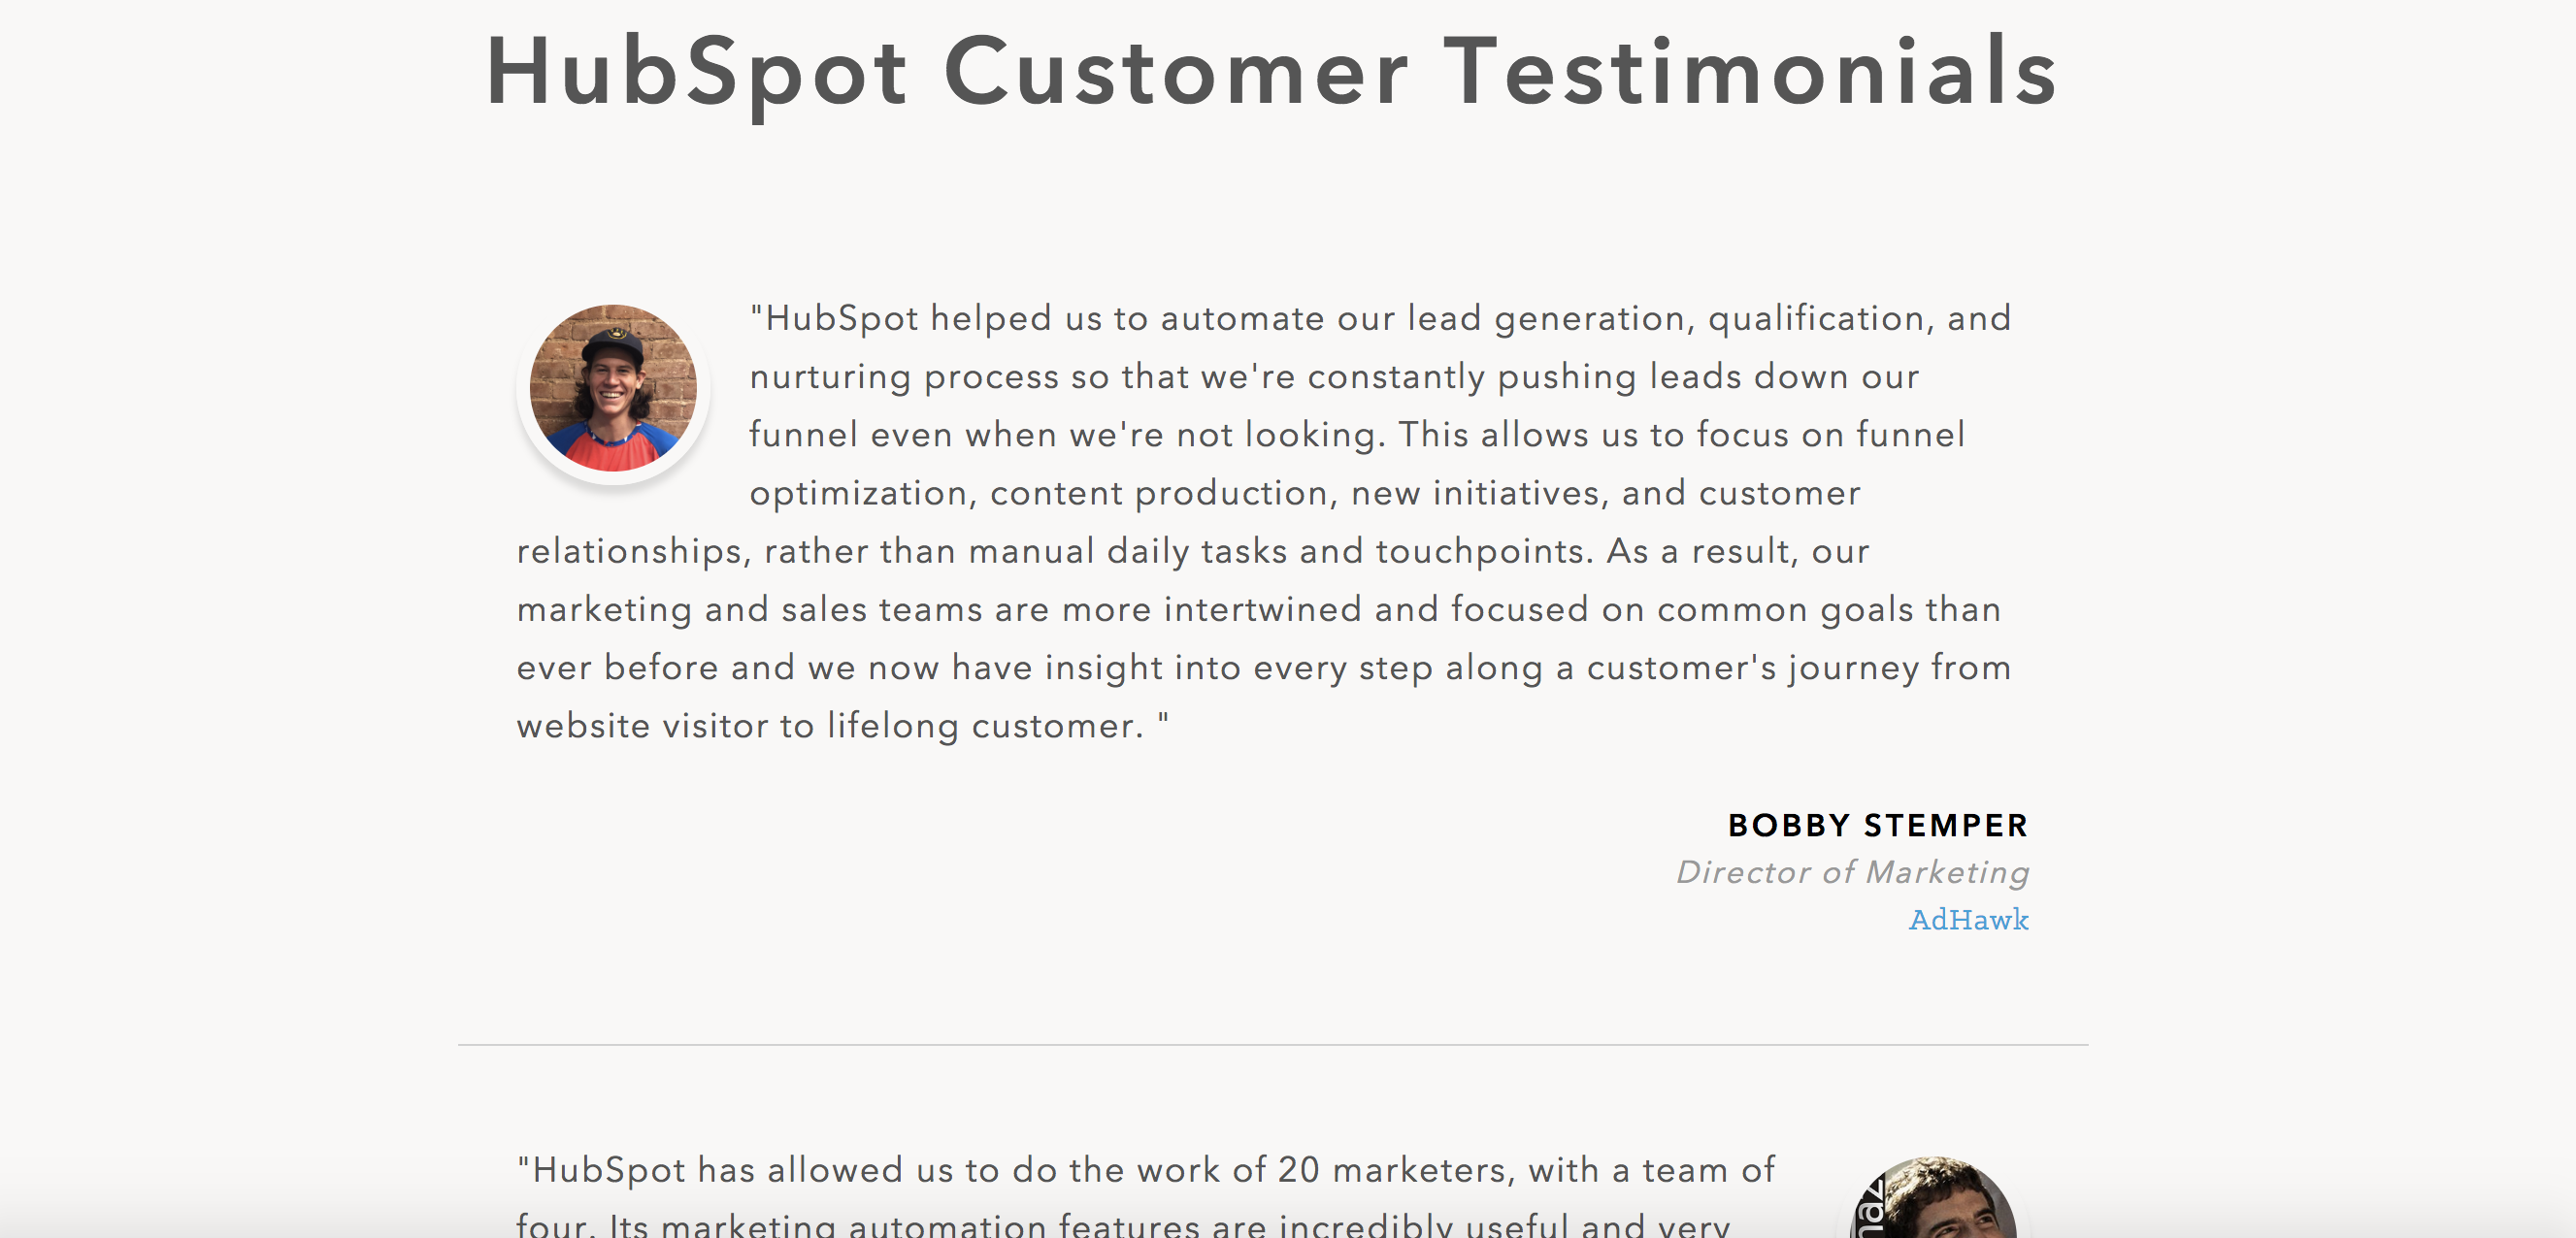 HubSpot-customer-testimonials